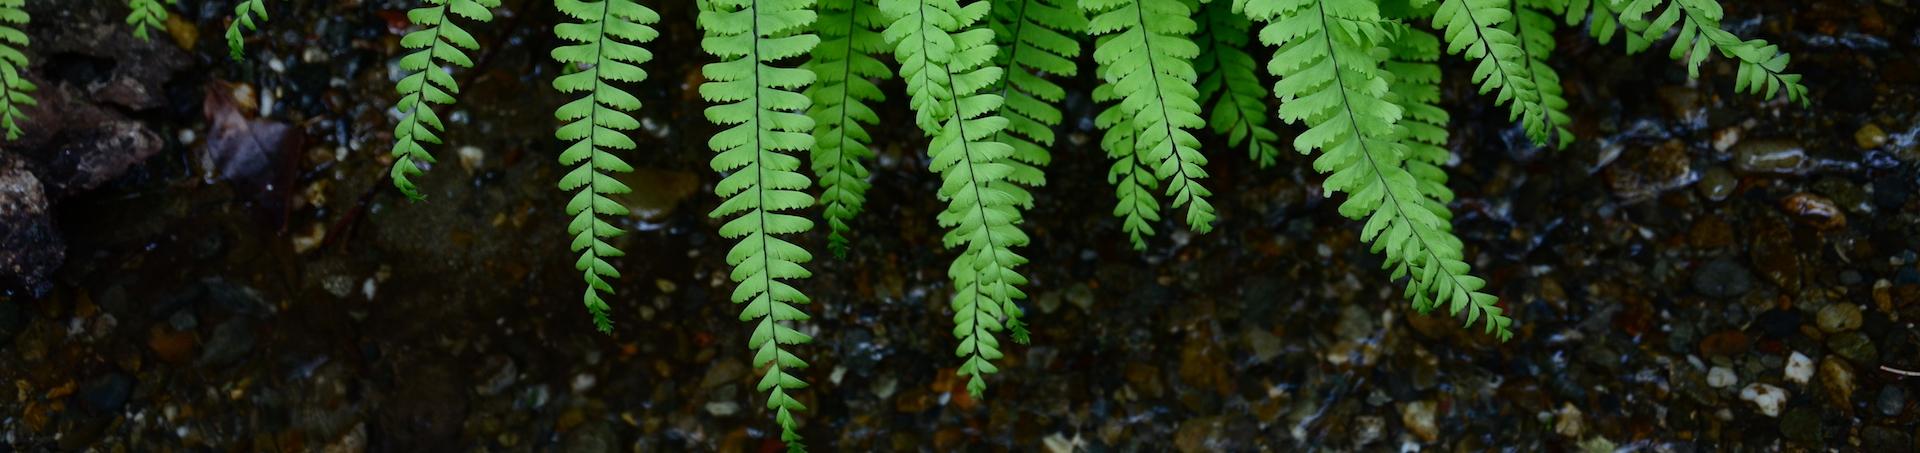 Green ferns draped over dark pebbles